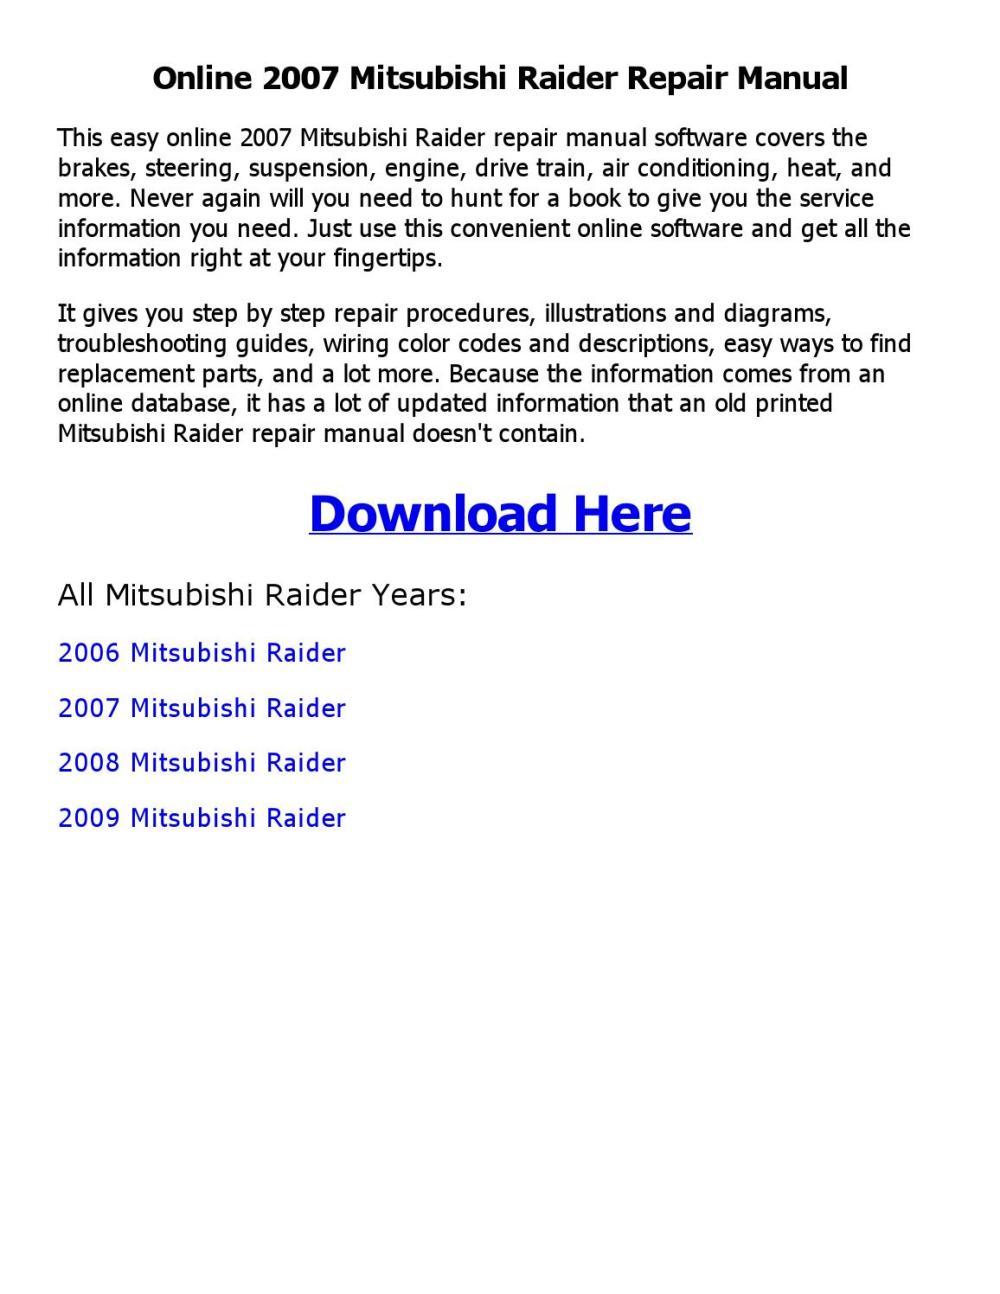 medium resolution of 2007 mitsubishi raider repair manual online by emran ahmed issuu